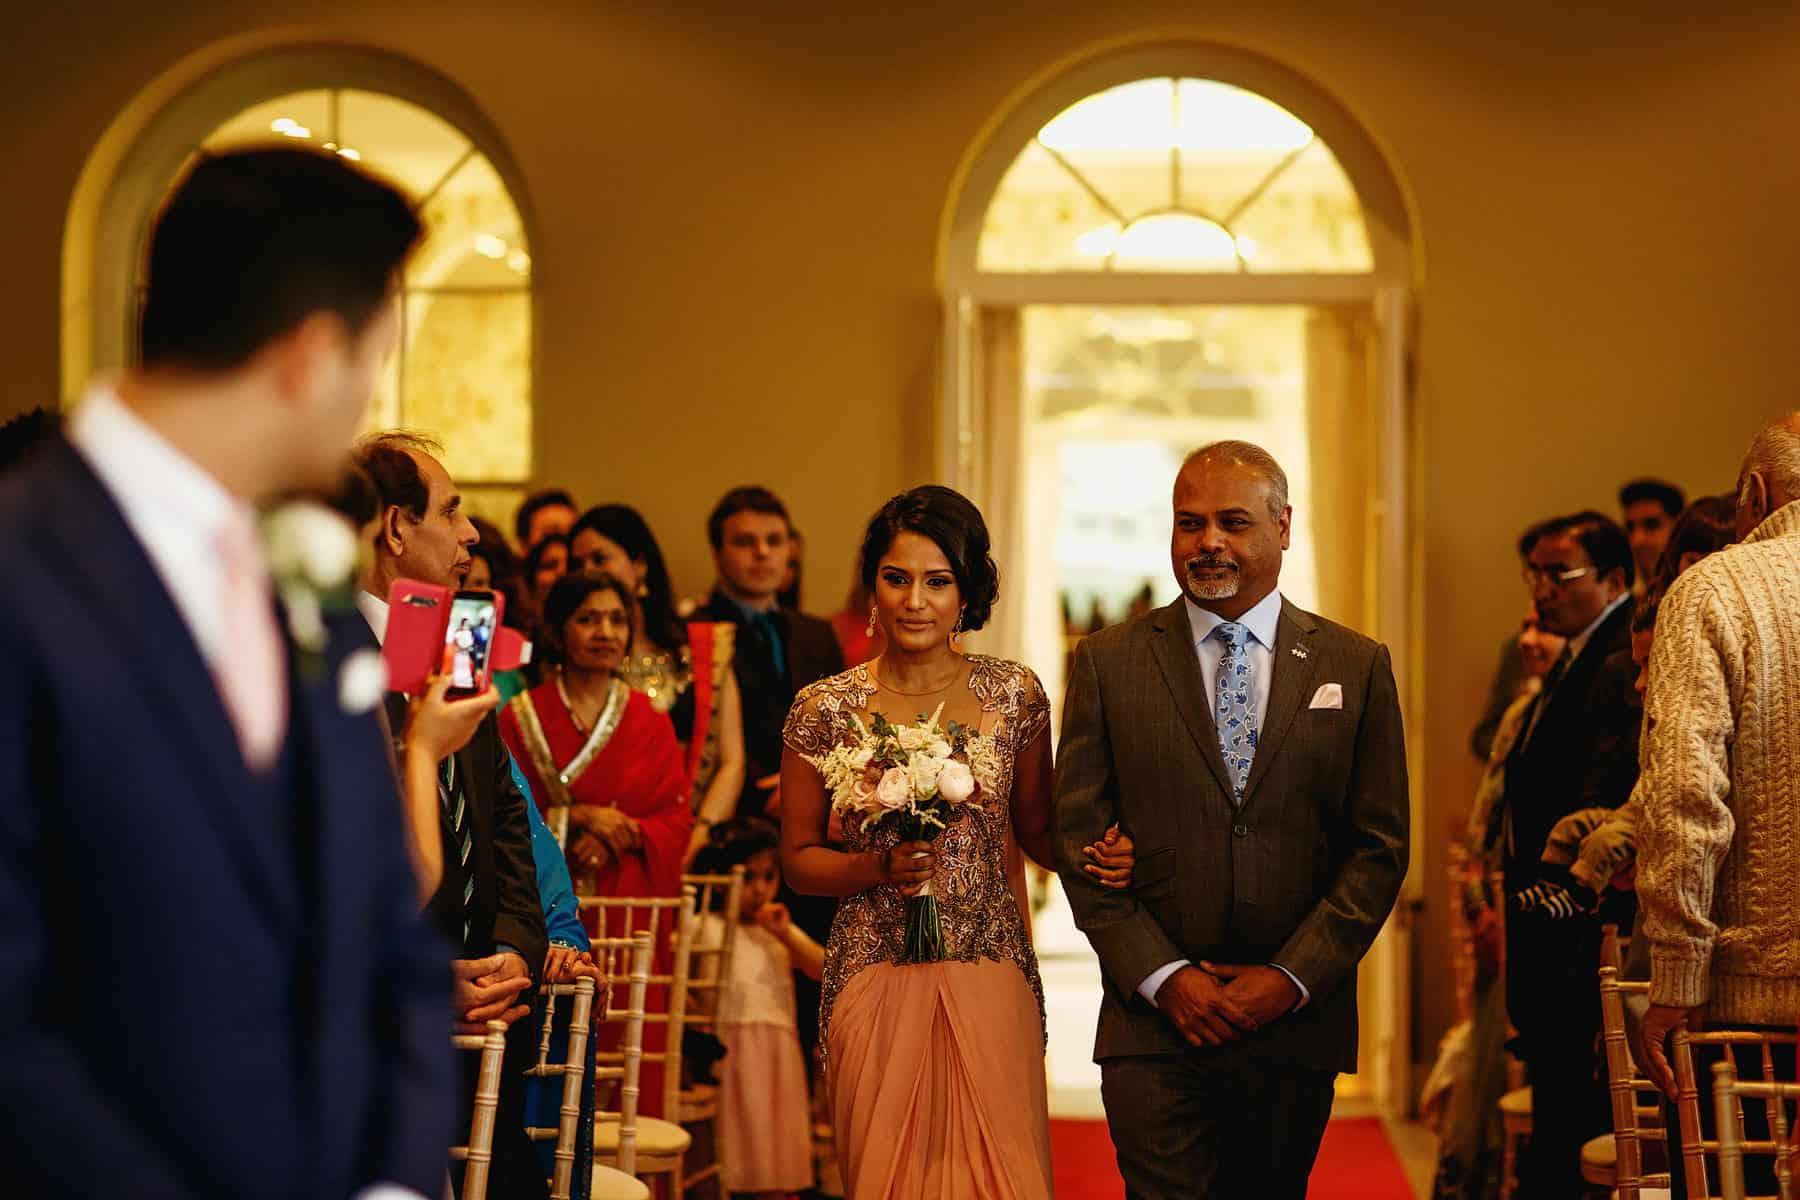 braxted park civil wedding photographer